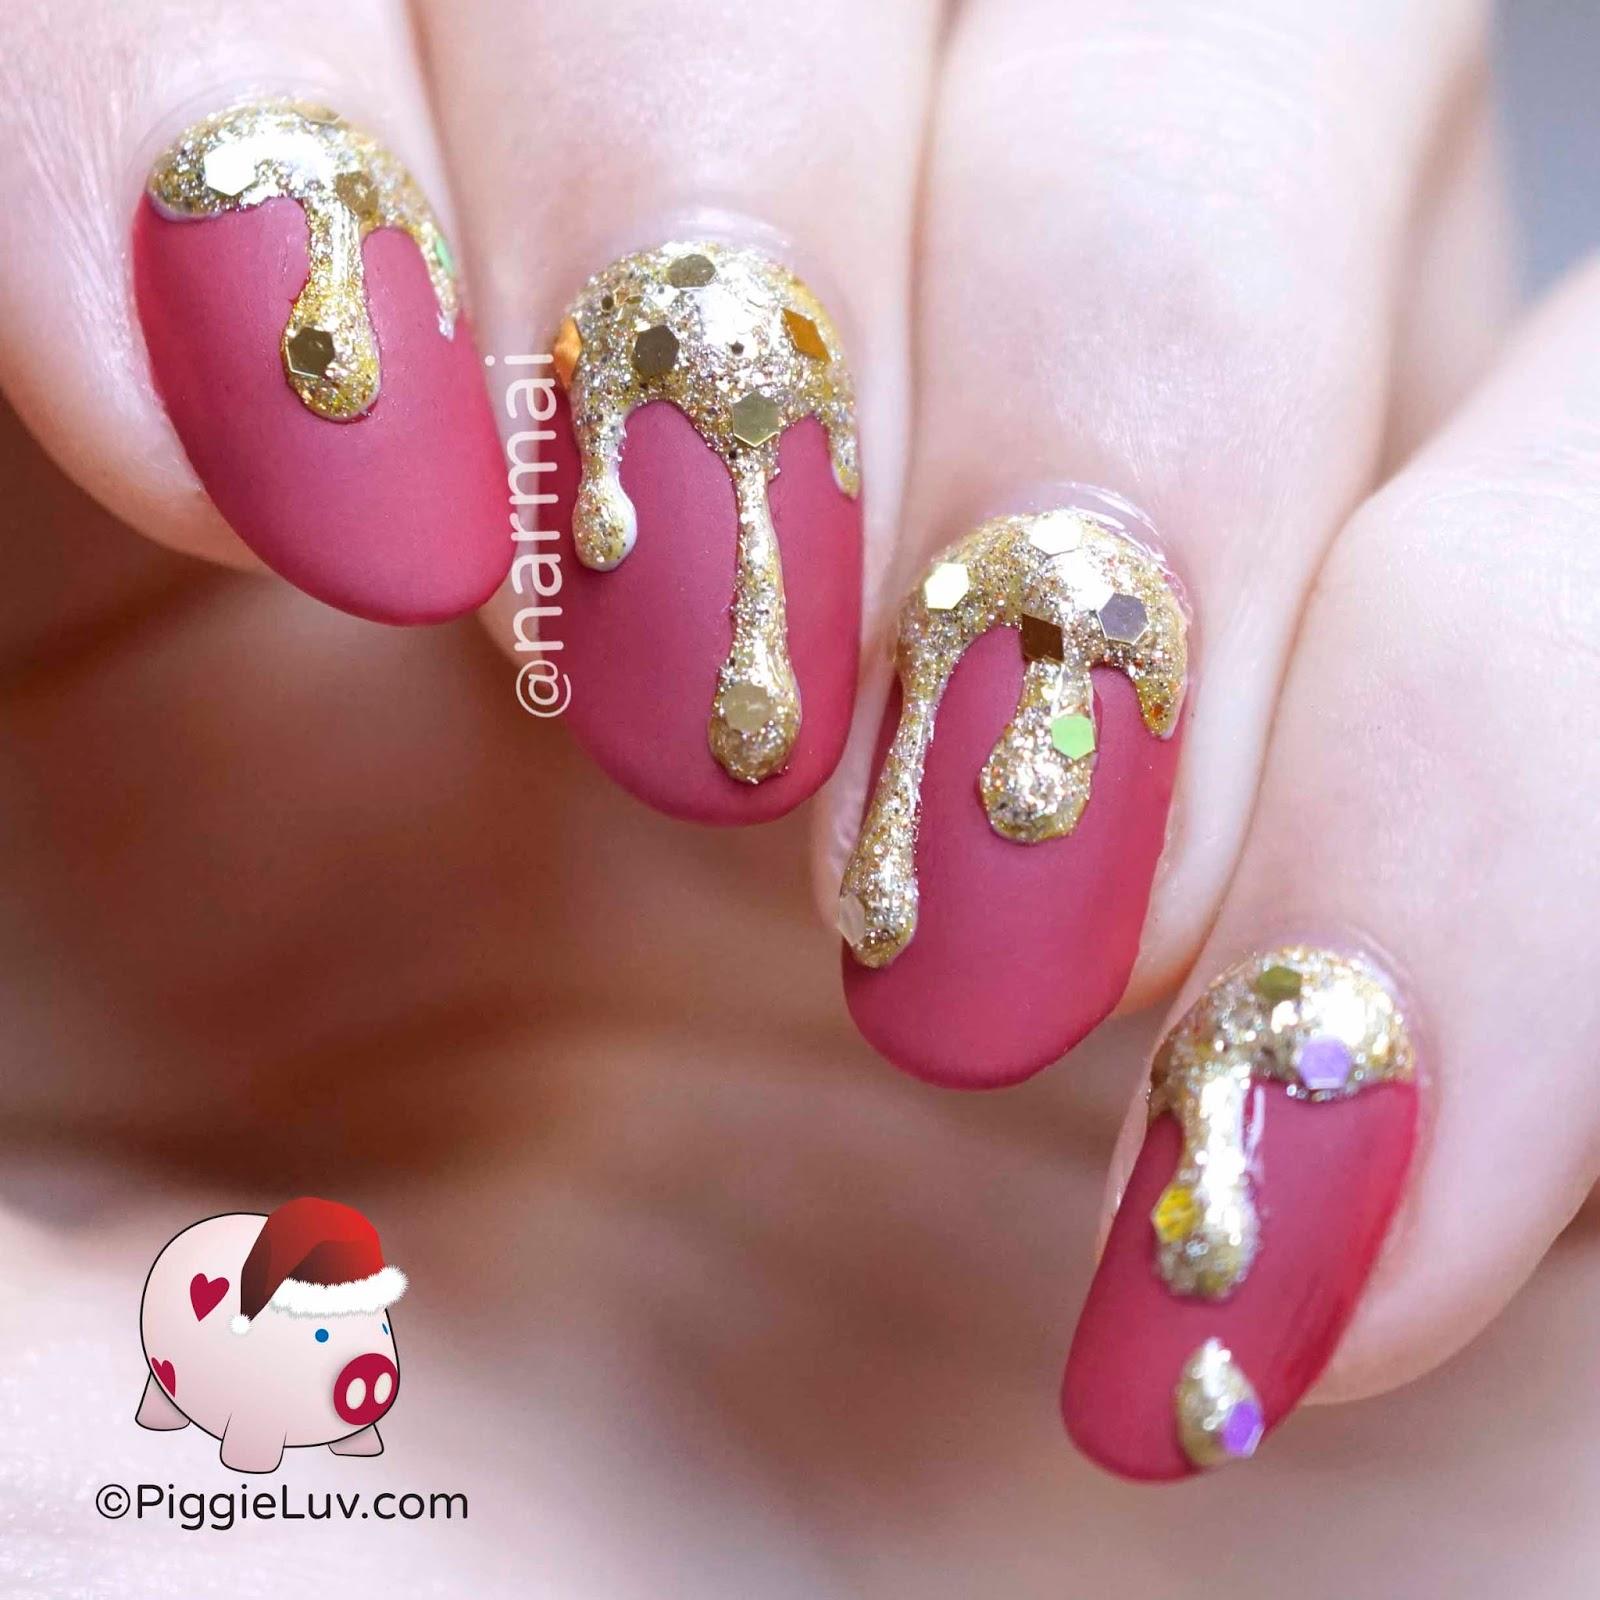 Piggieluv Golden Christmas Drips Nail Art